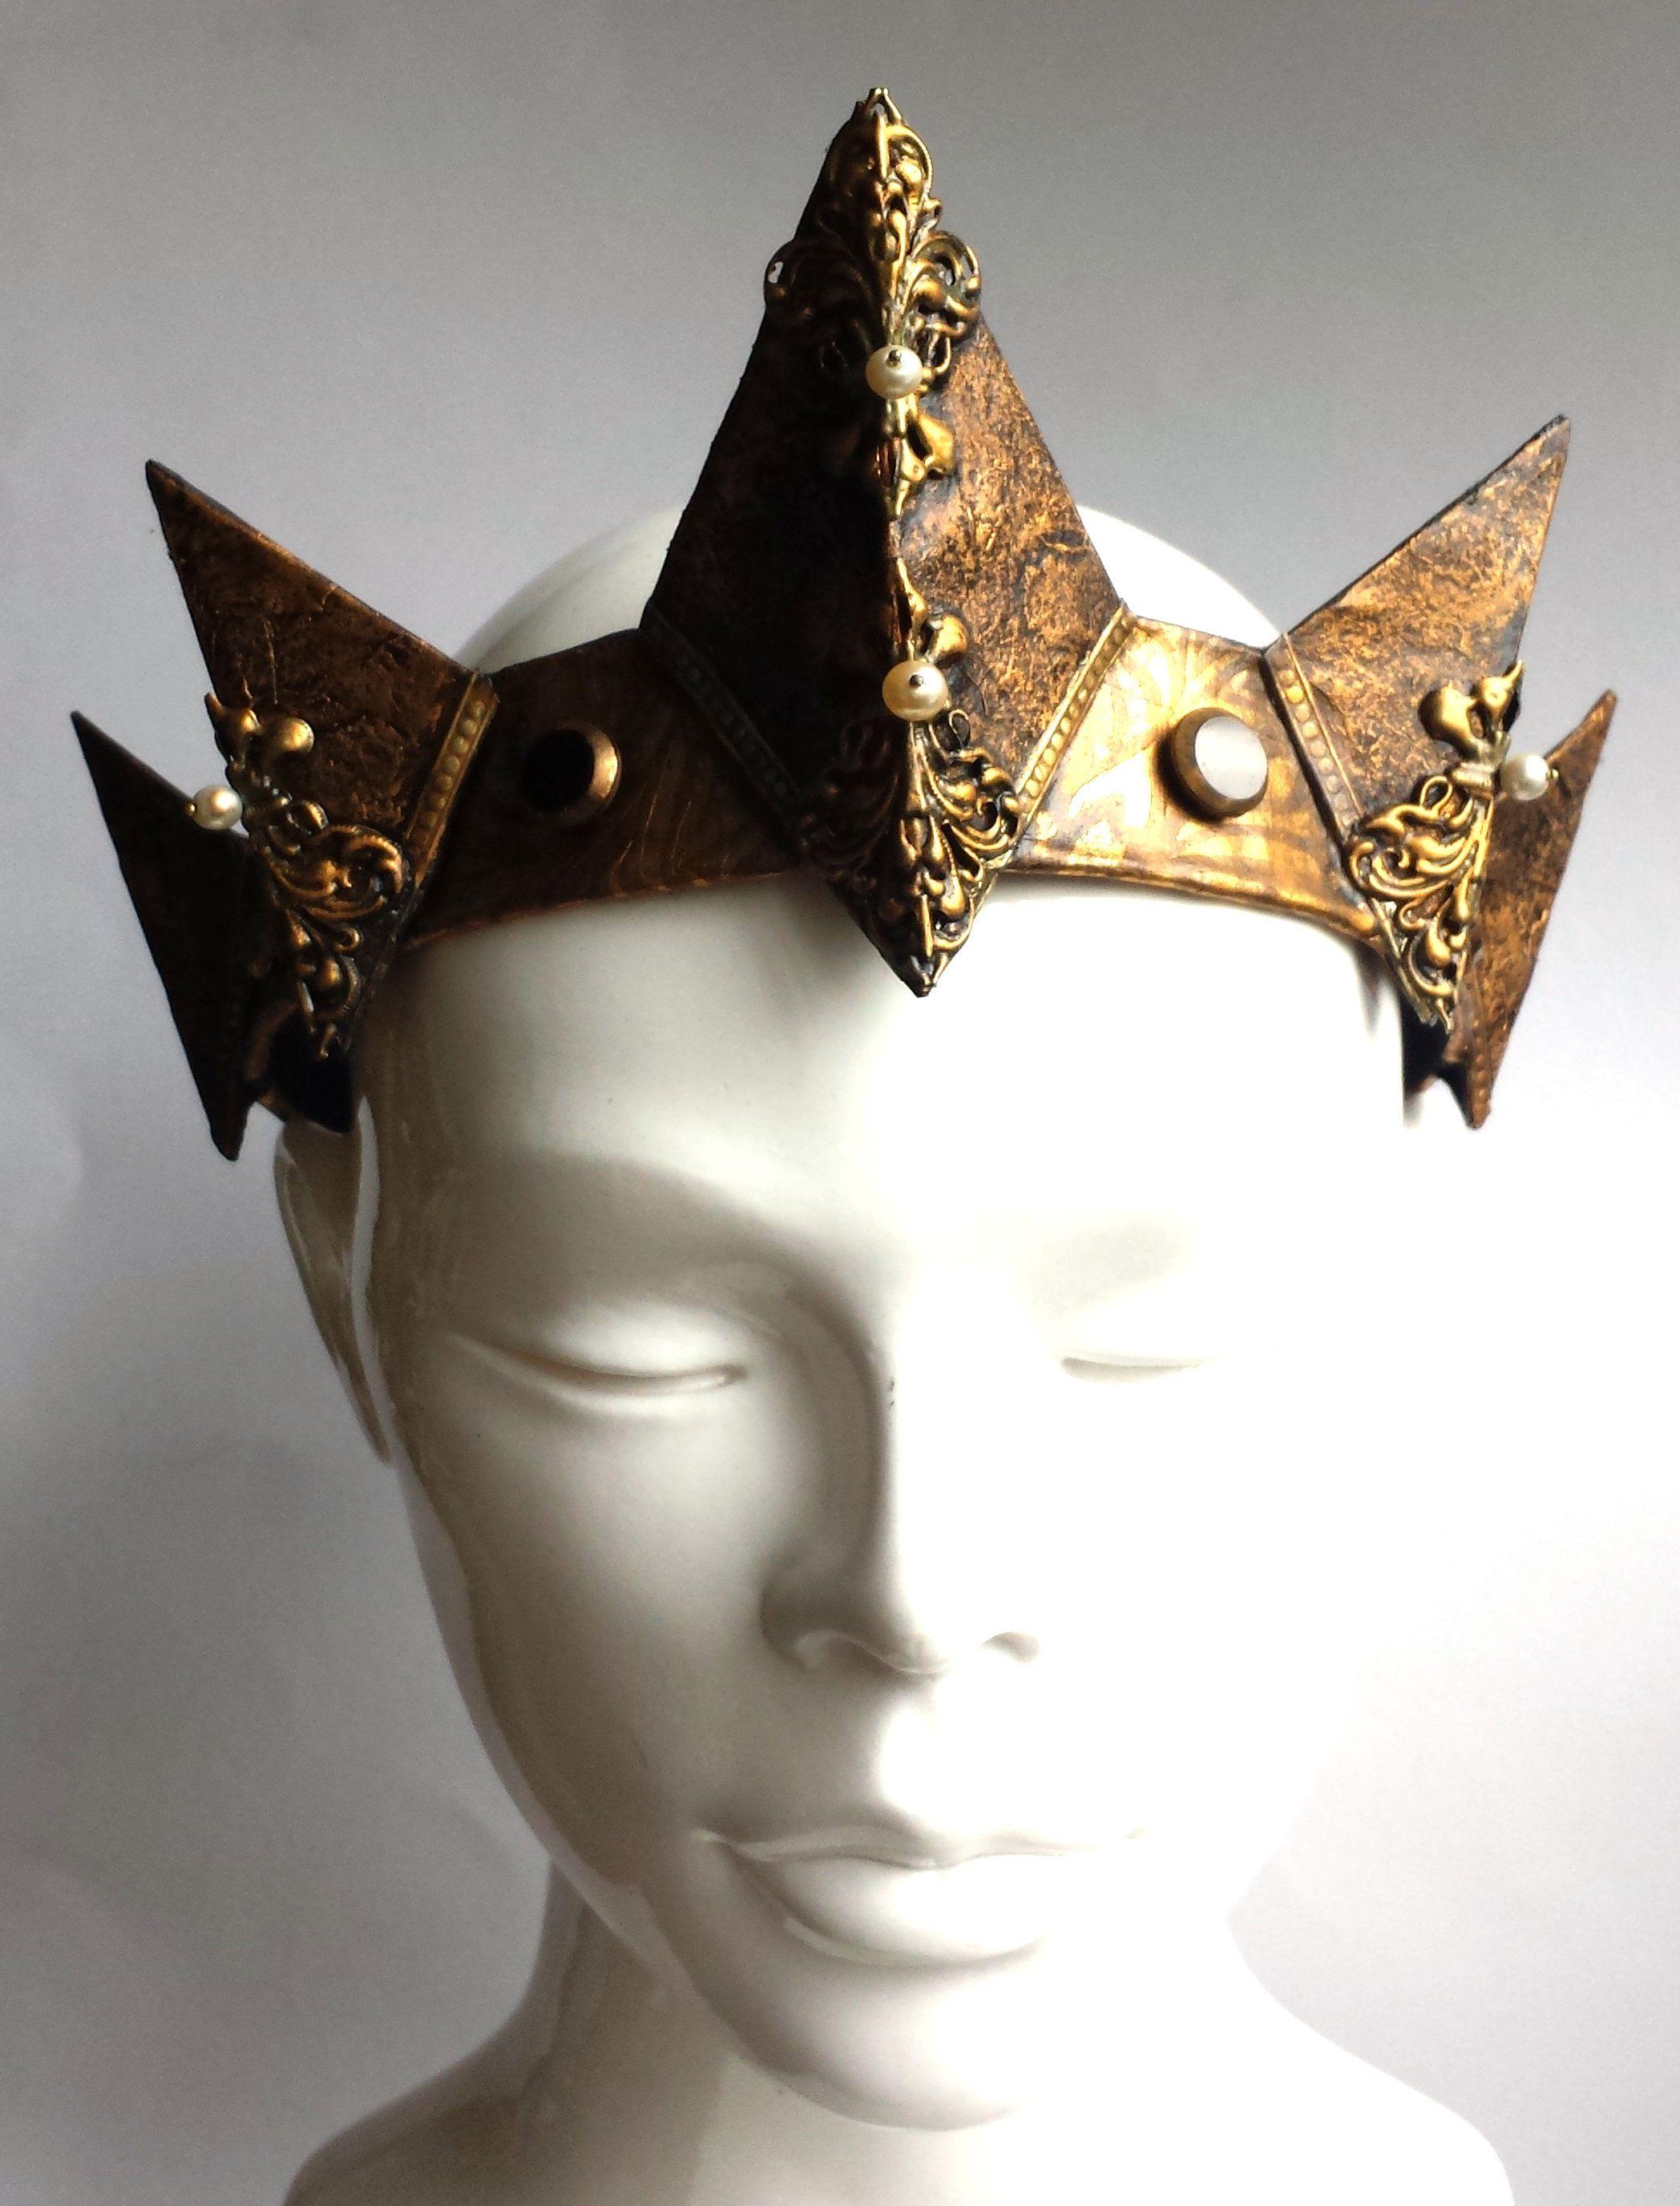 crown gold bronze man gothic old king women medieval fantasy